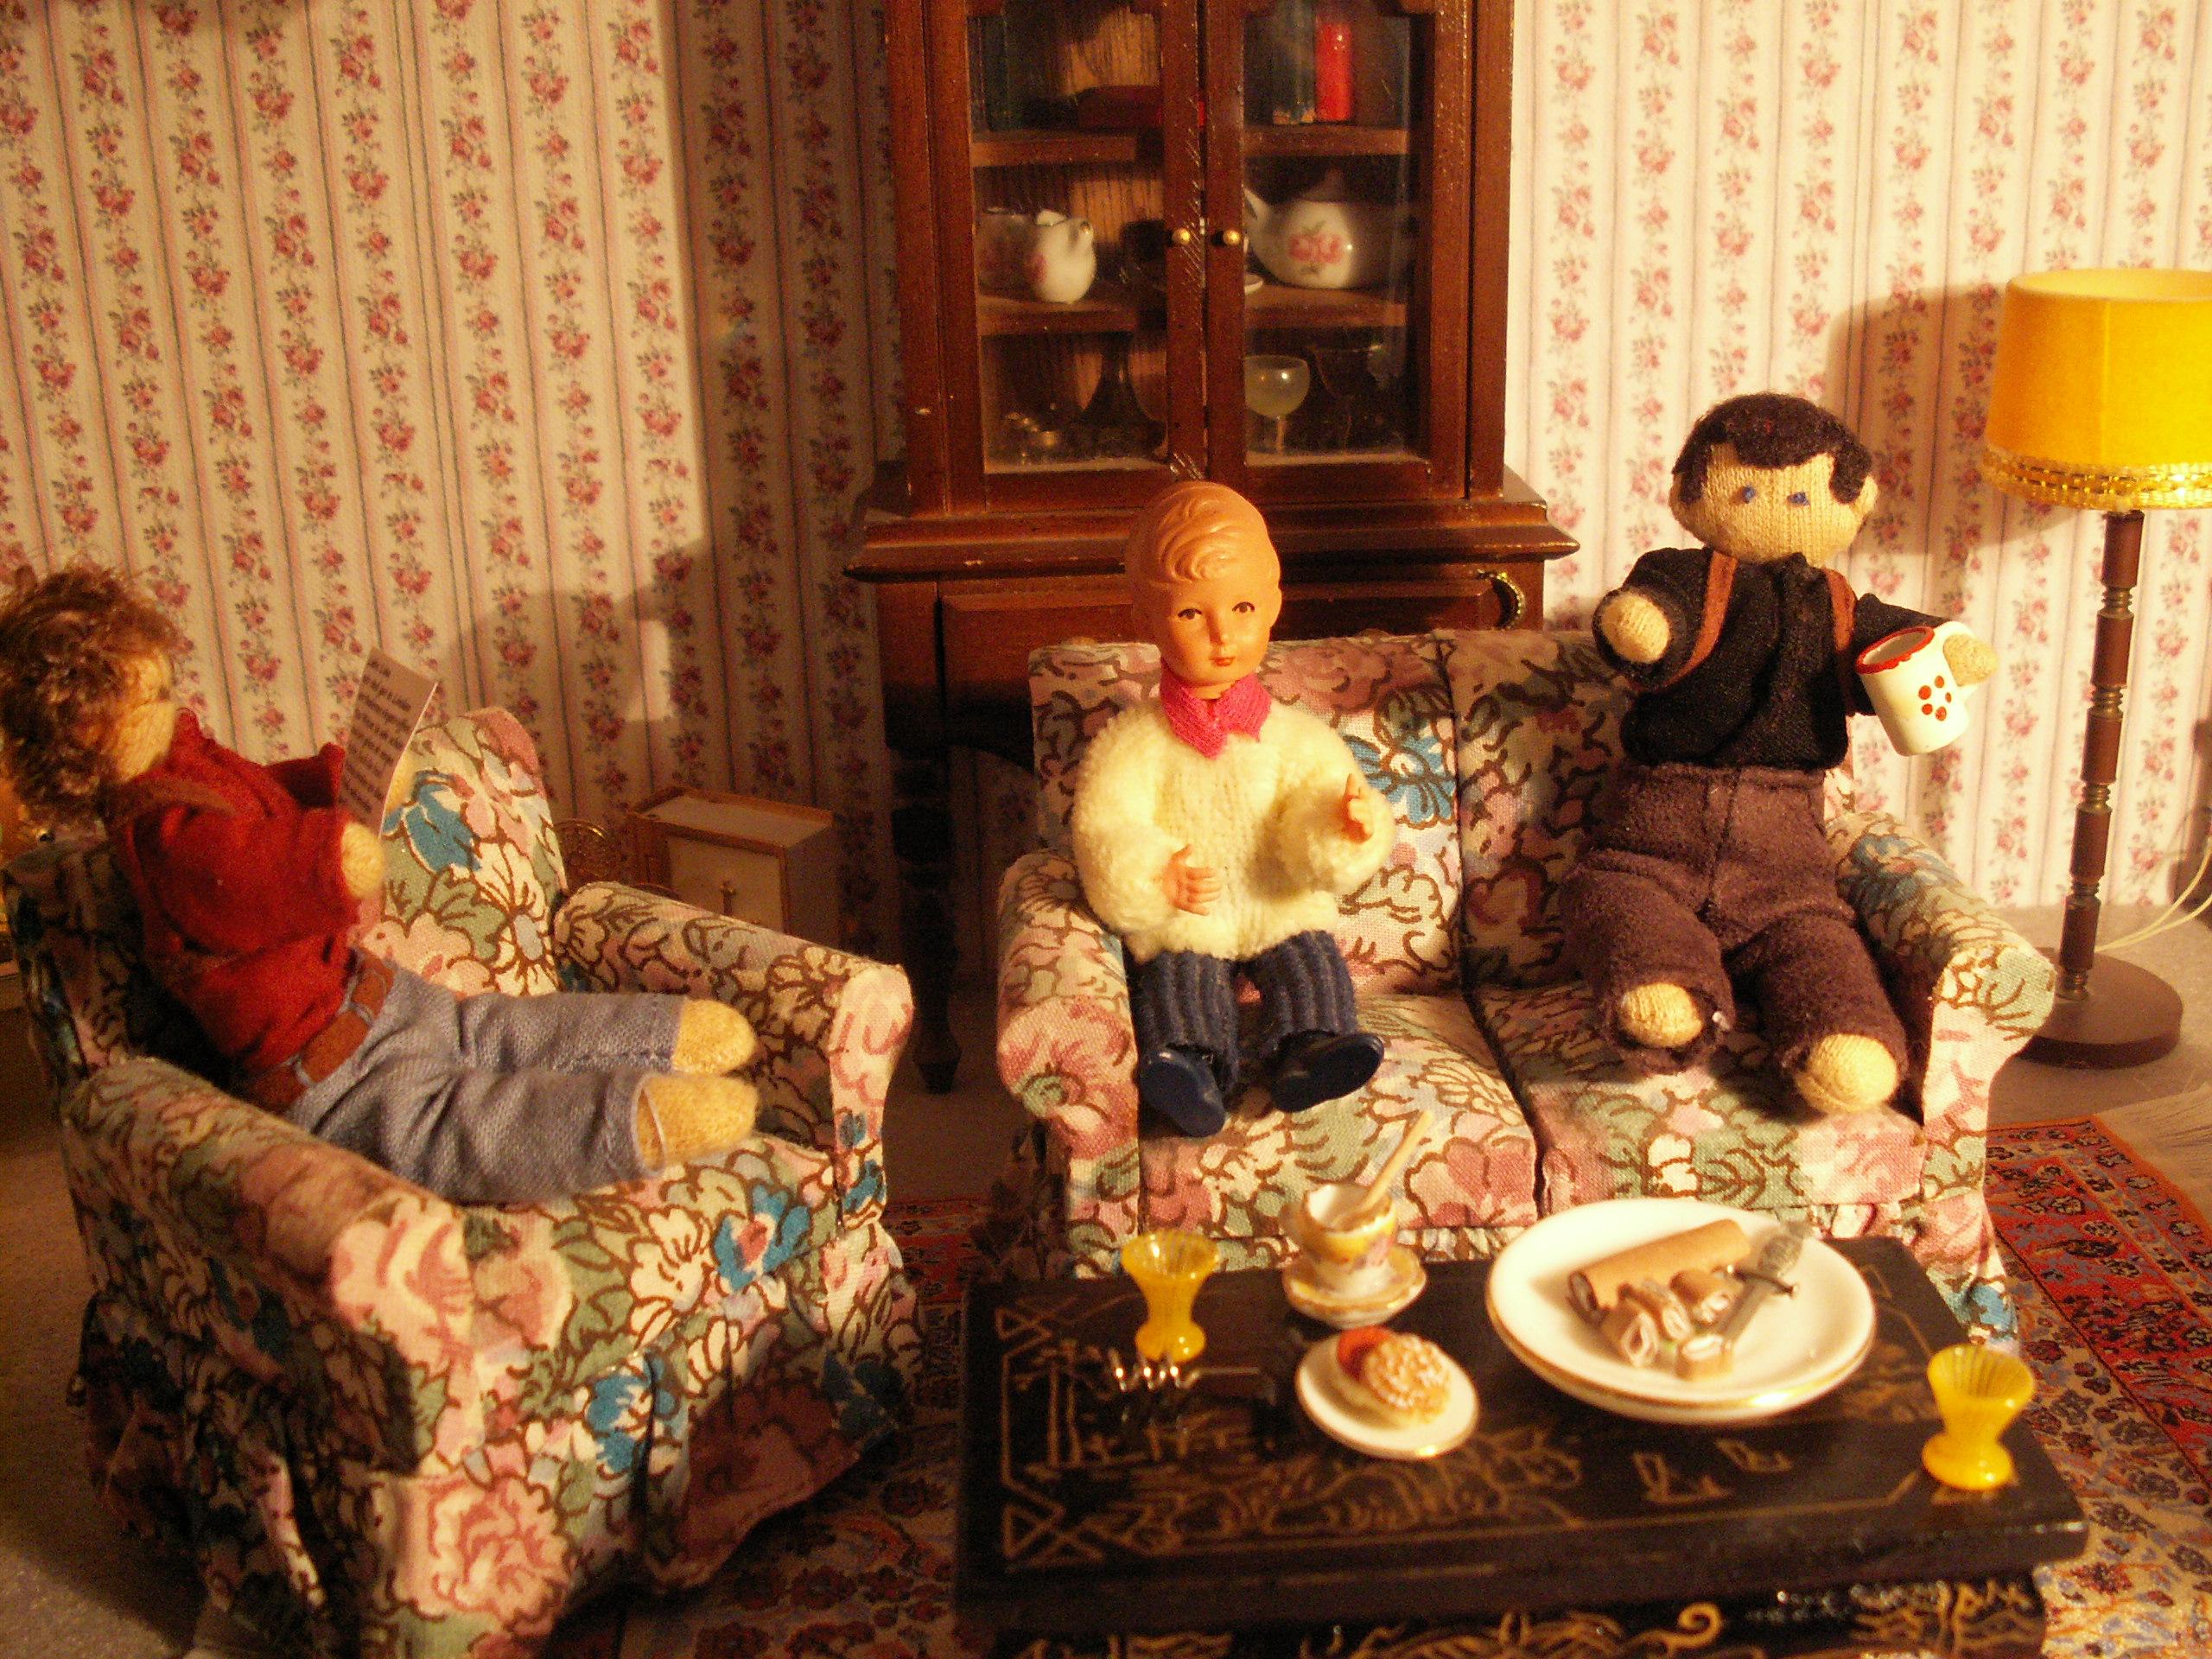 Tea and Swissroll 5